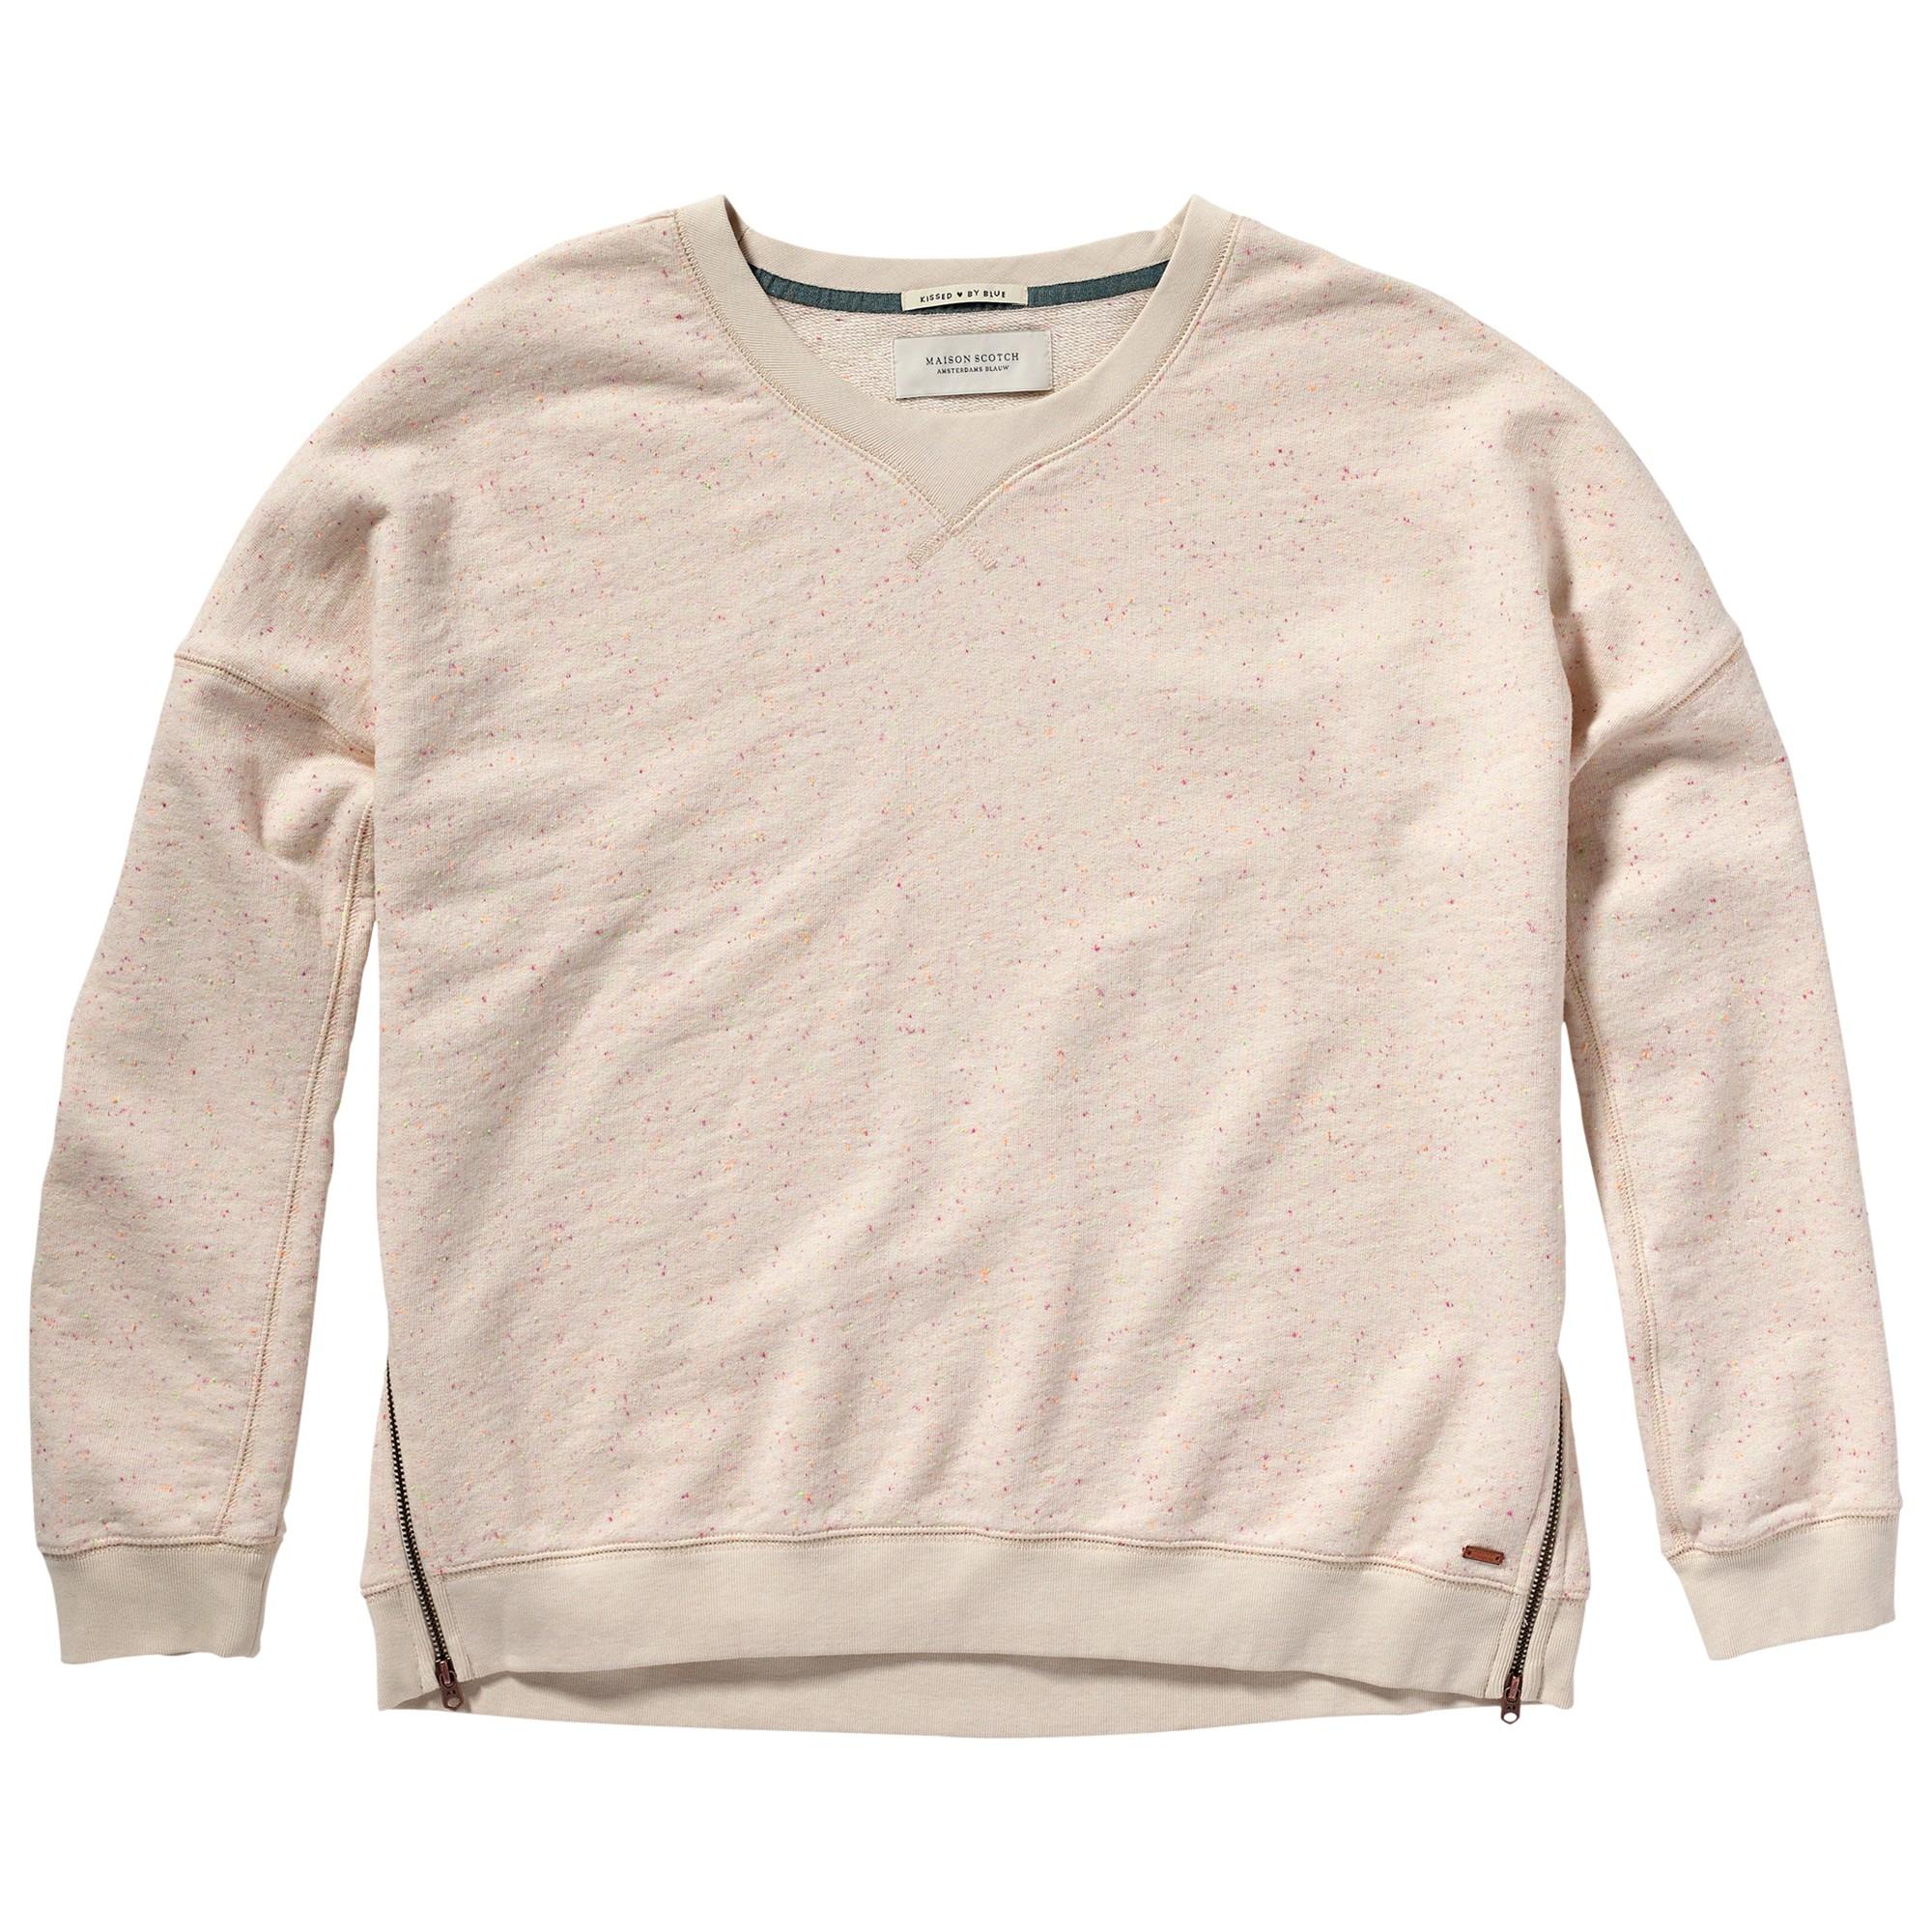 Maison scotch zip detail sweatshirt in natural lyst for Atelier maison scotch